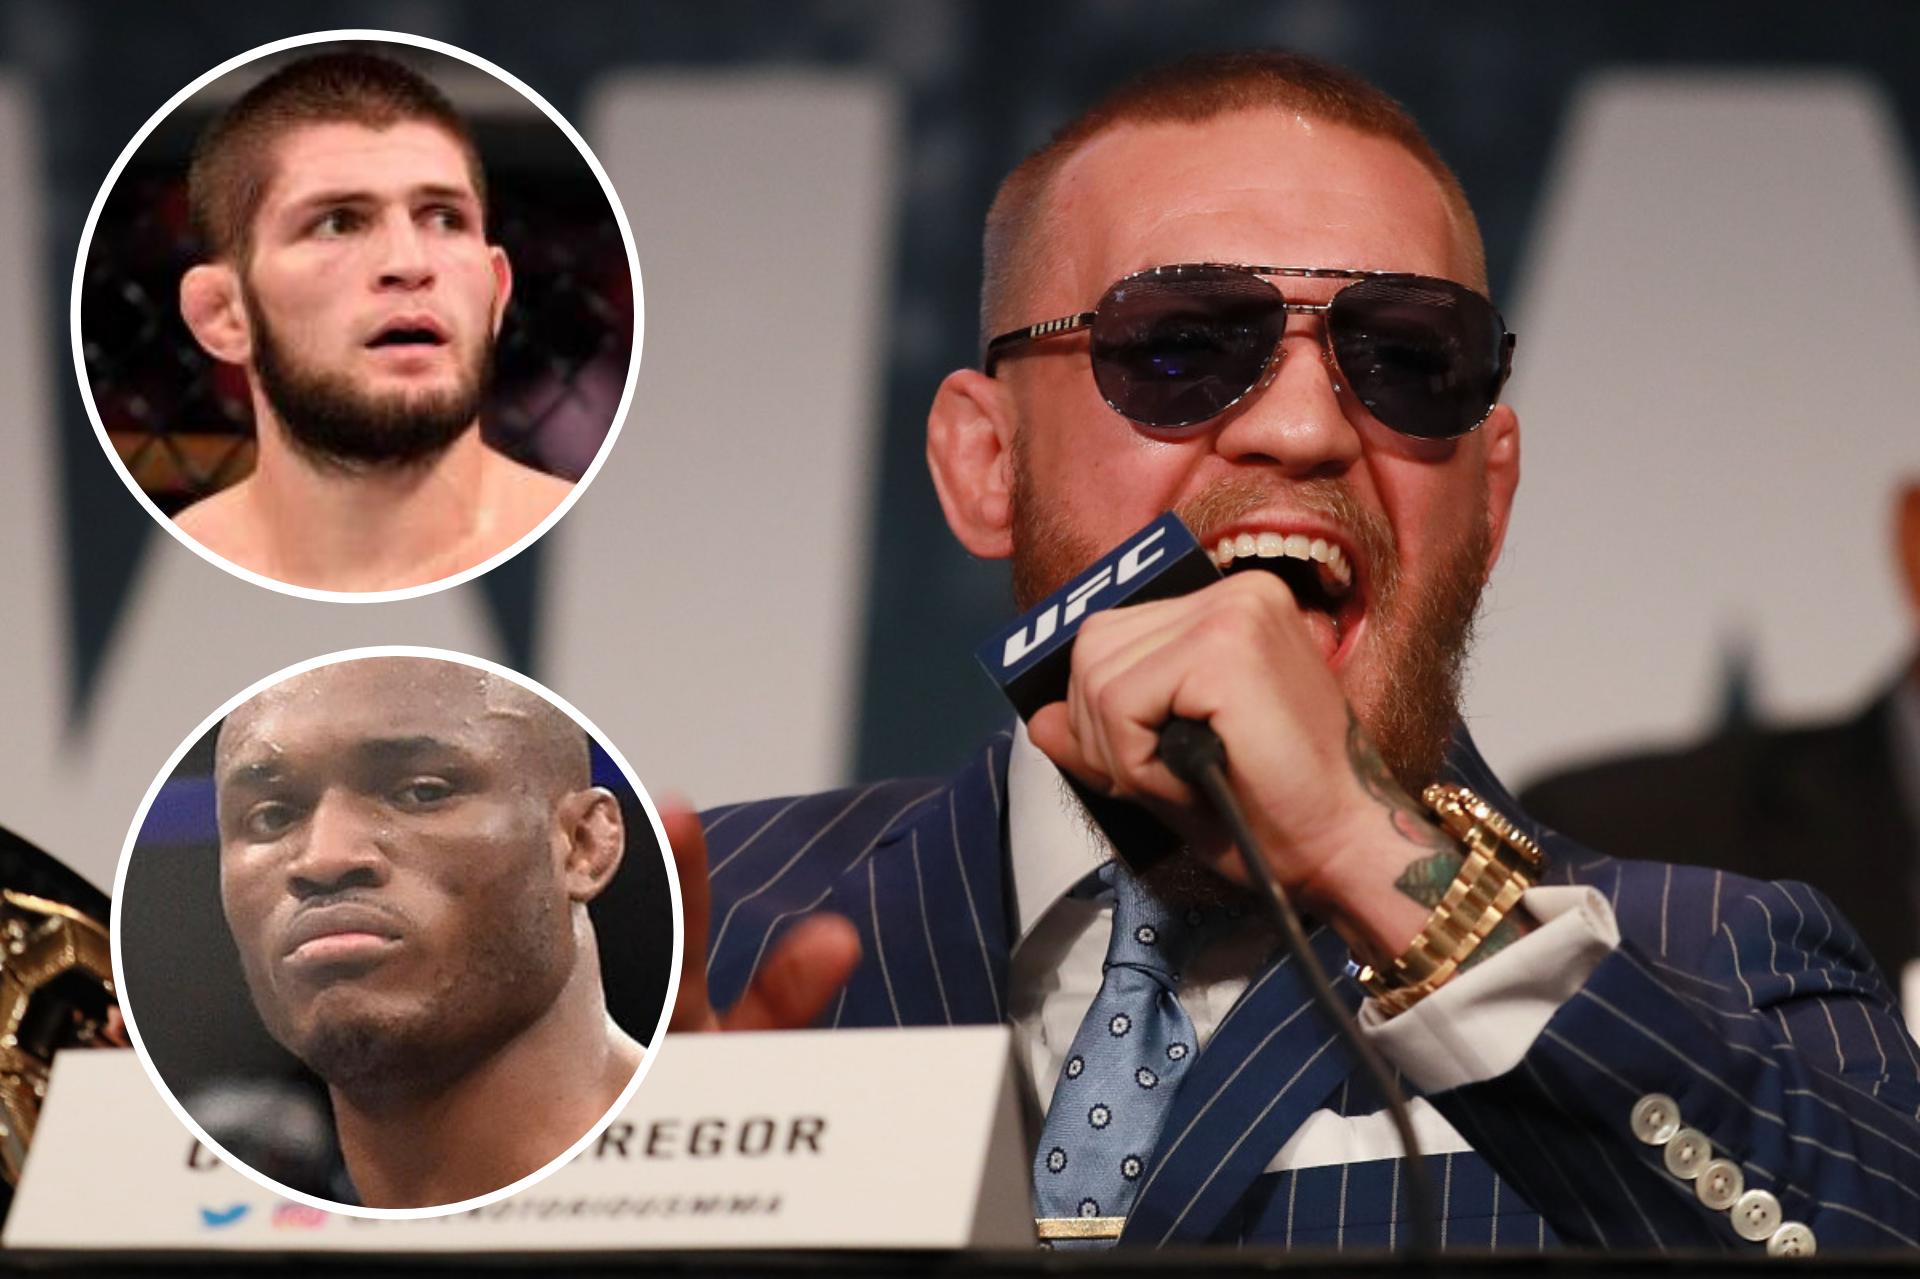 UFC News: Conor McGregor trolls Khabib, Usman for their 'sniff the jockstrap' style of fighting - McGregor